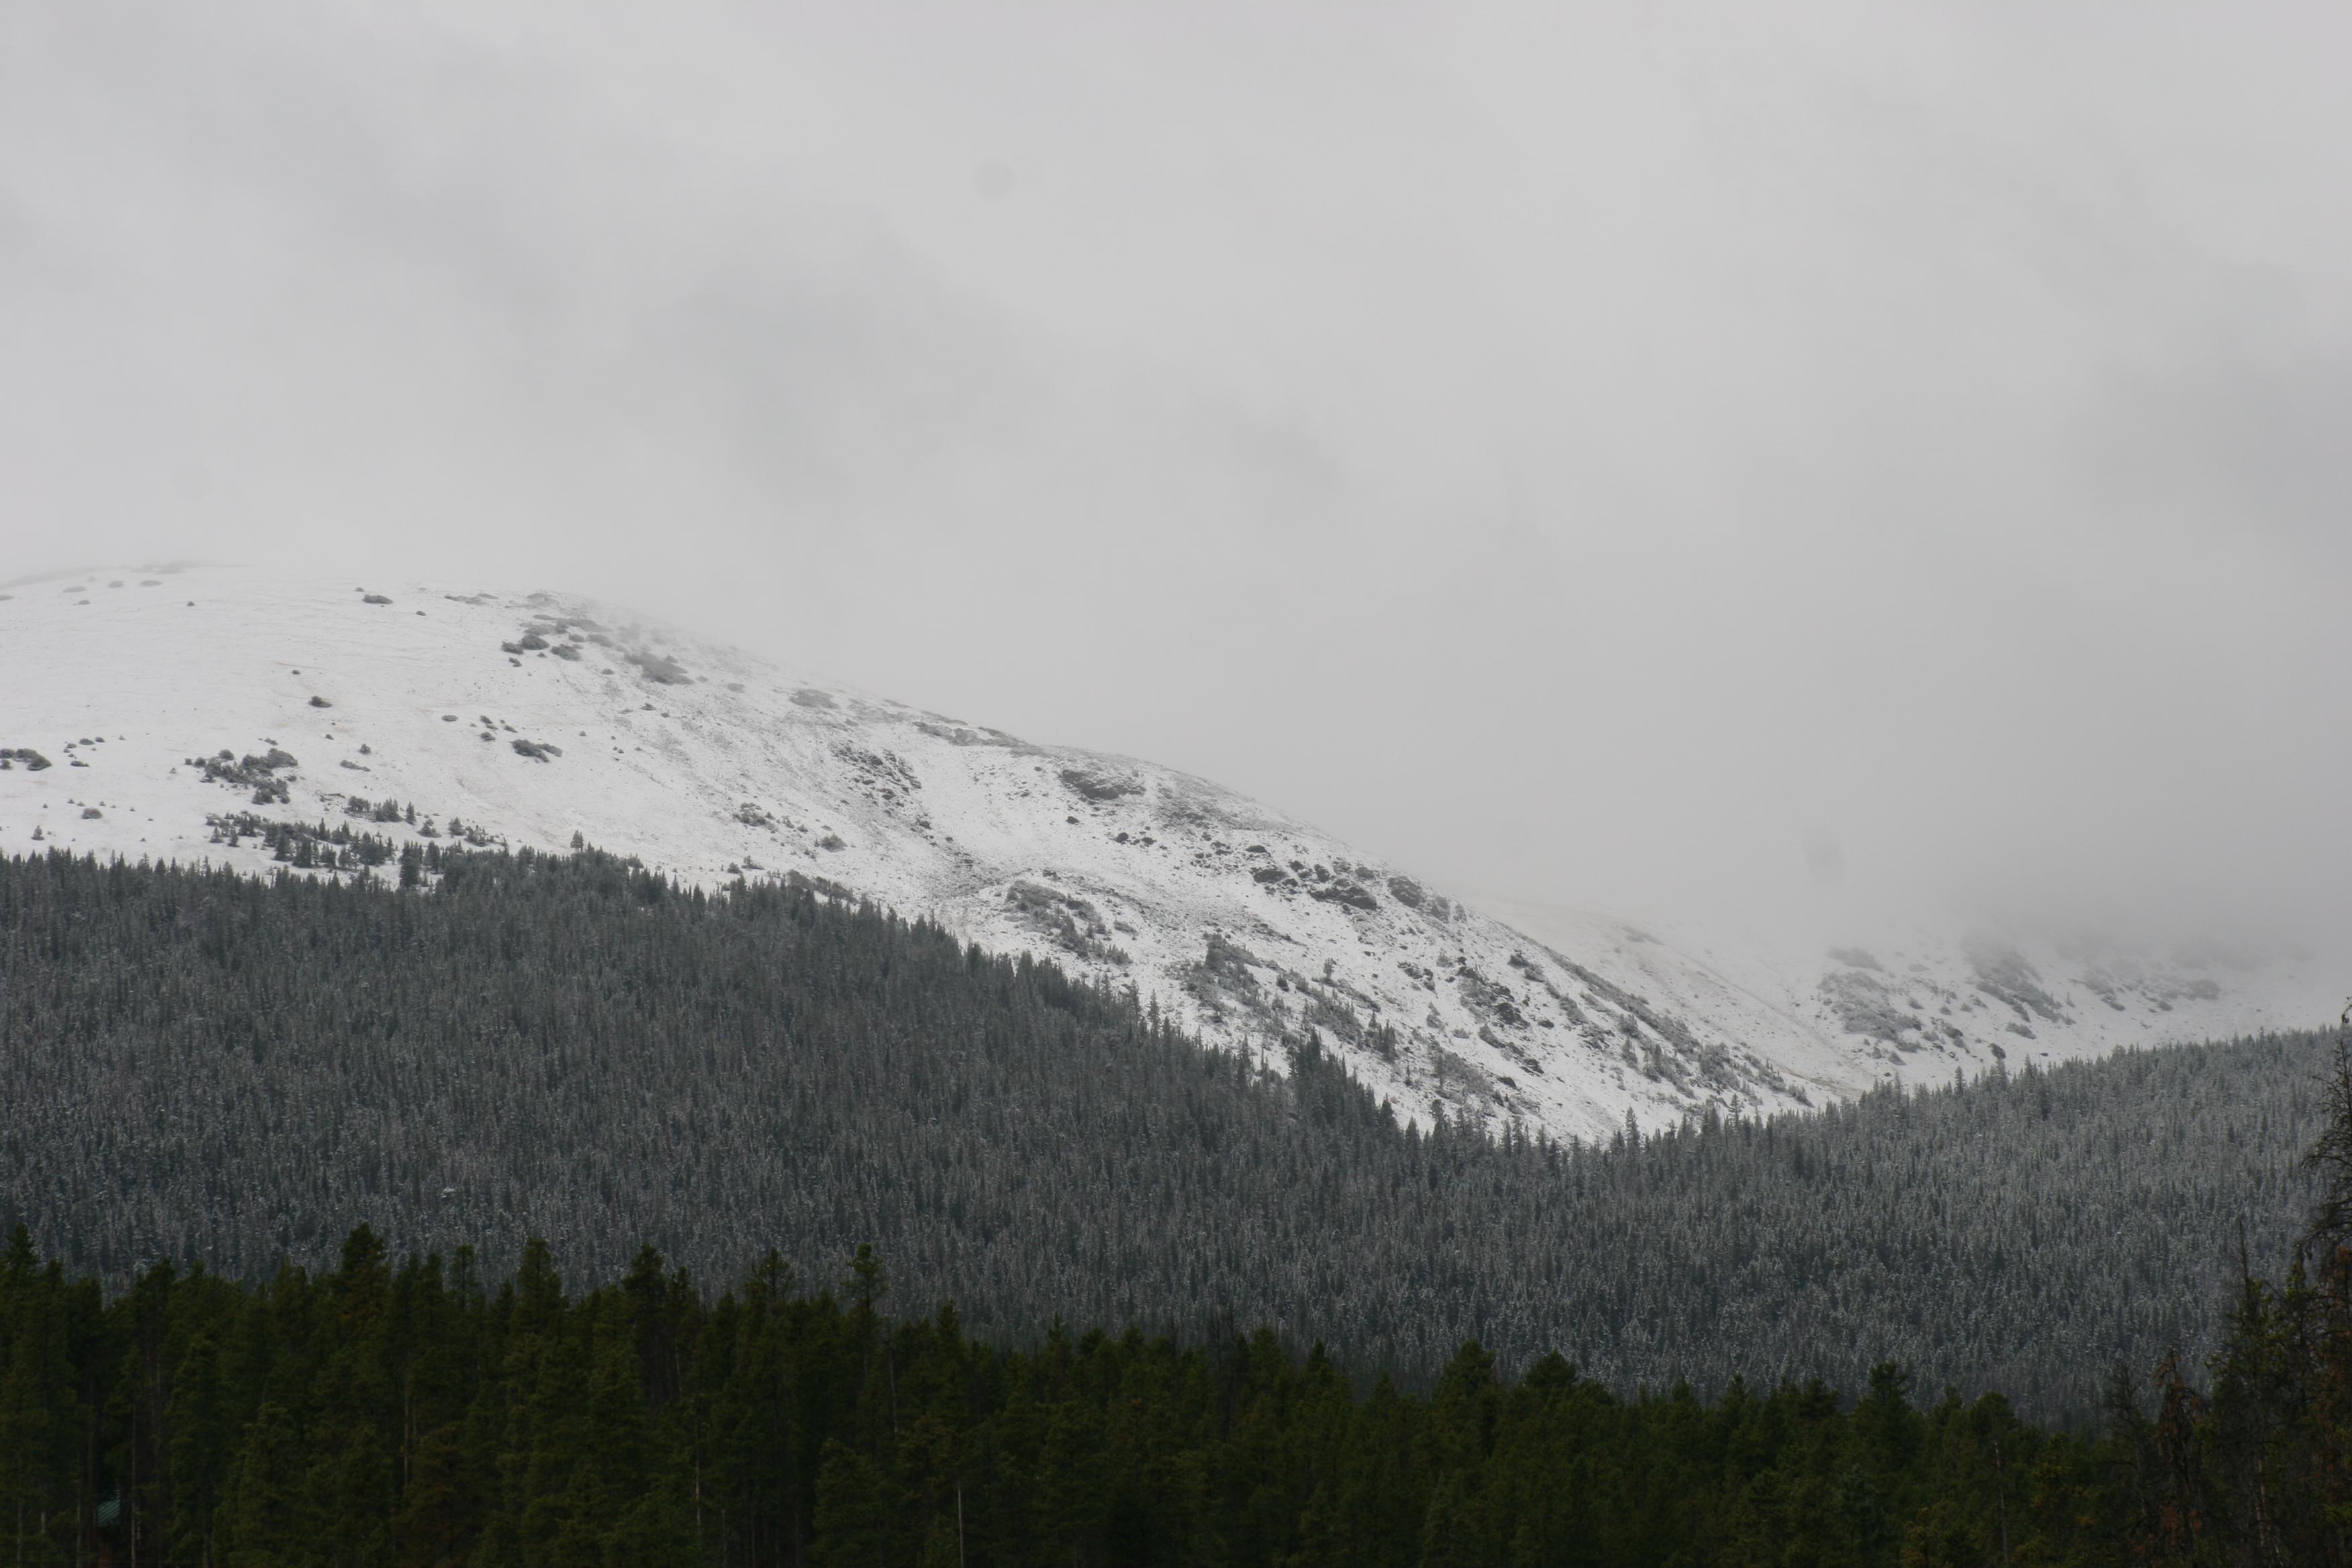 Snow in Colorado's Mtn Towns!